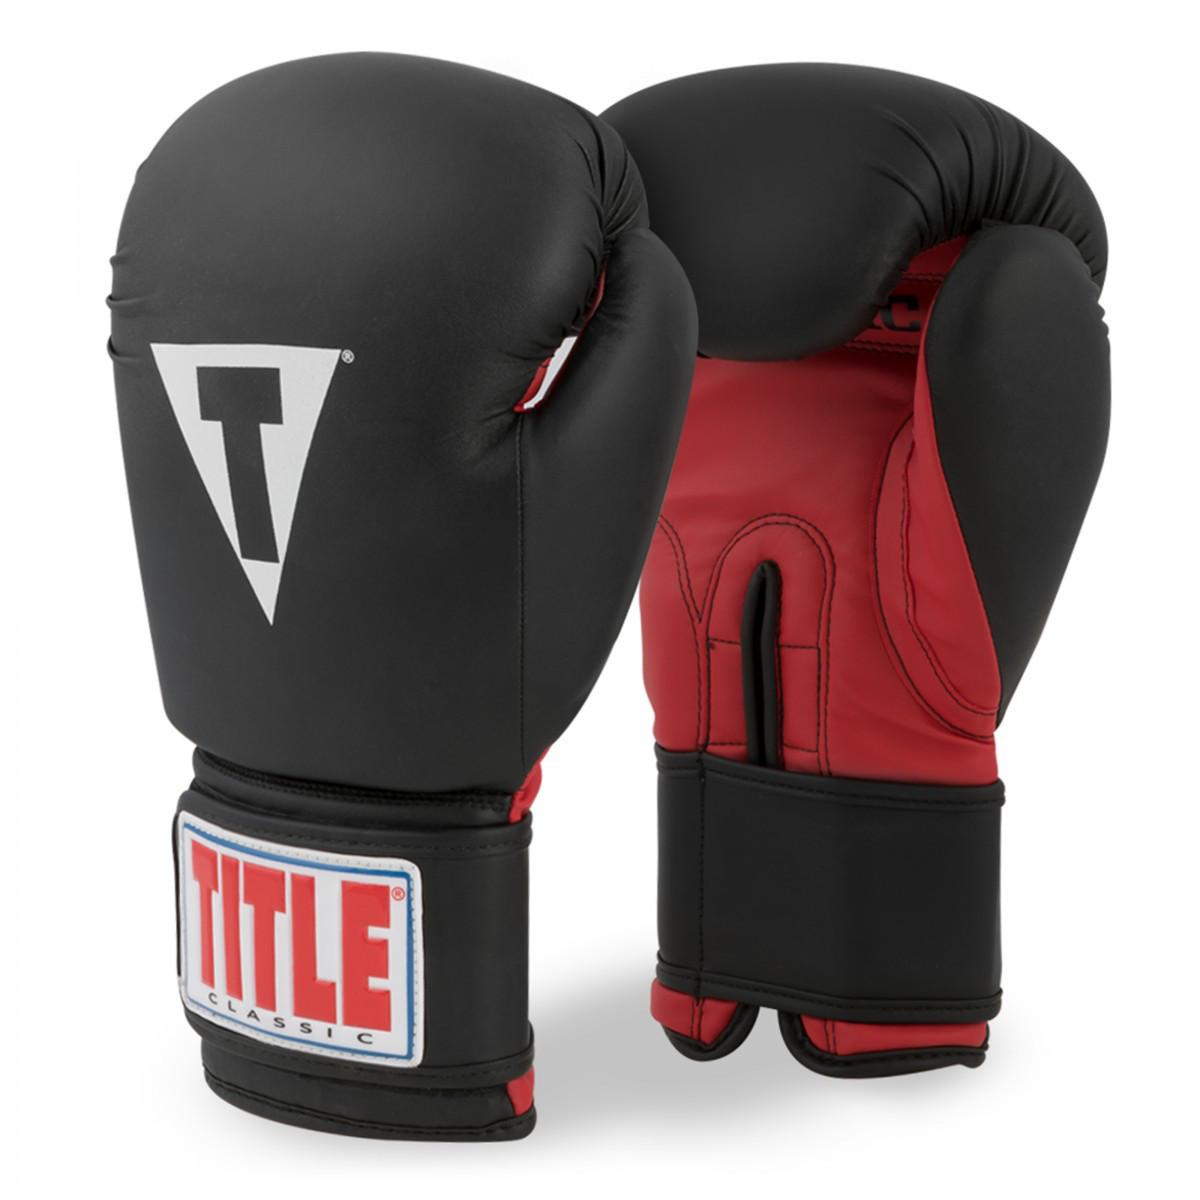 Перчатки для бокса TITLE CLASSIC